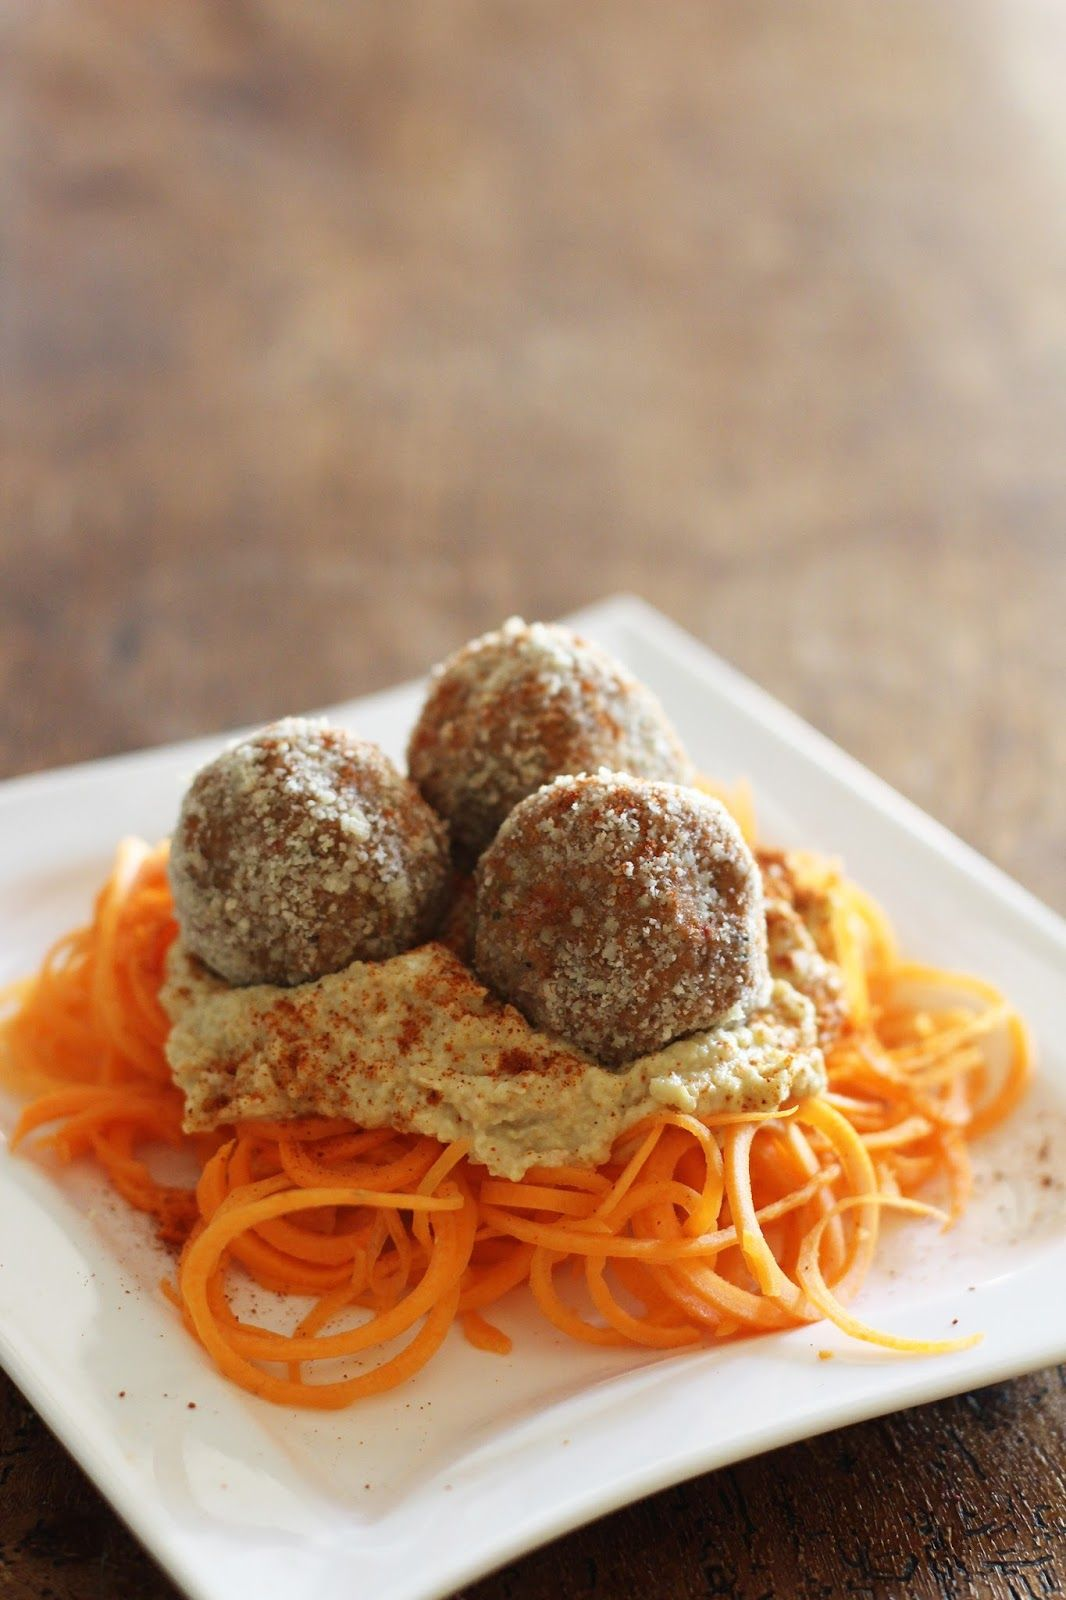 raw mushroom walnut meatballs with hummus and carrot